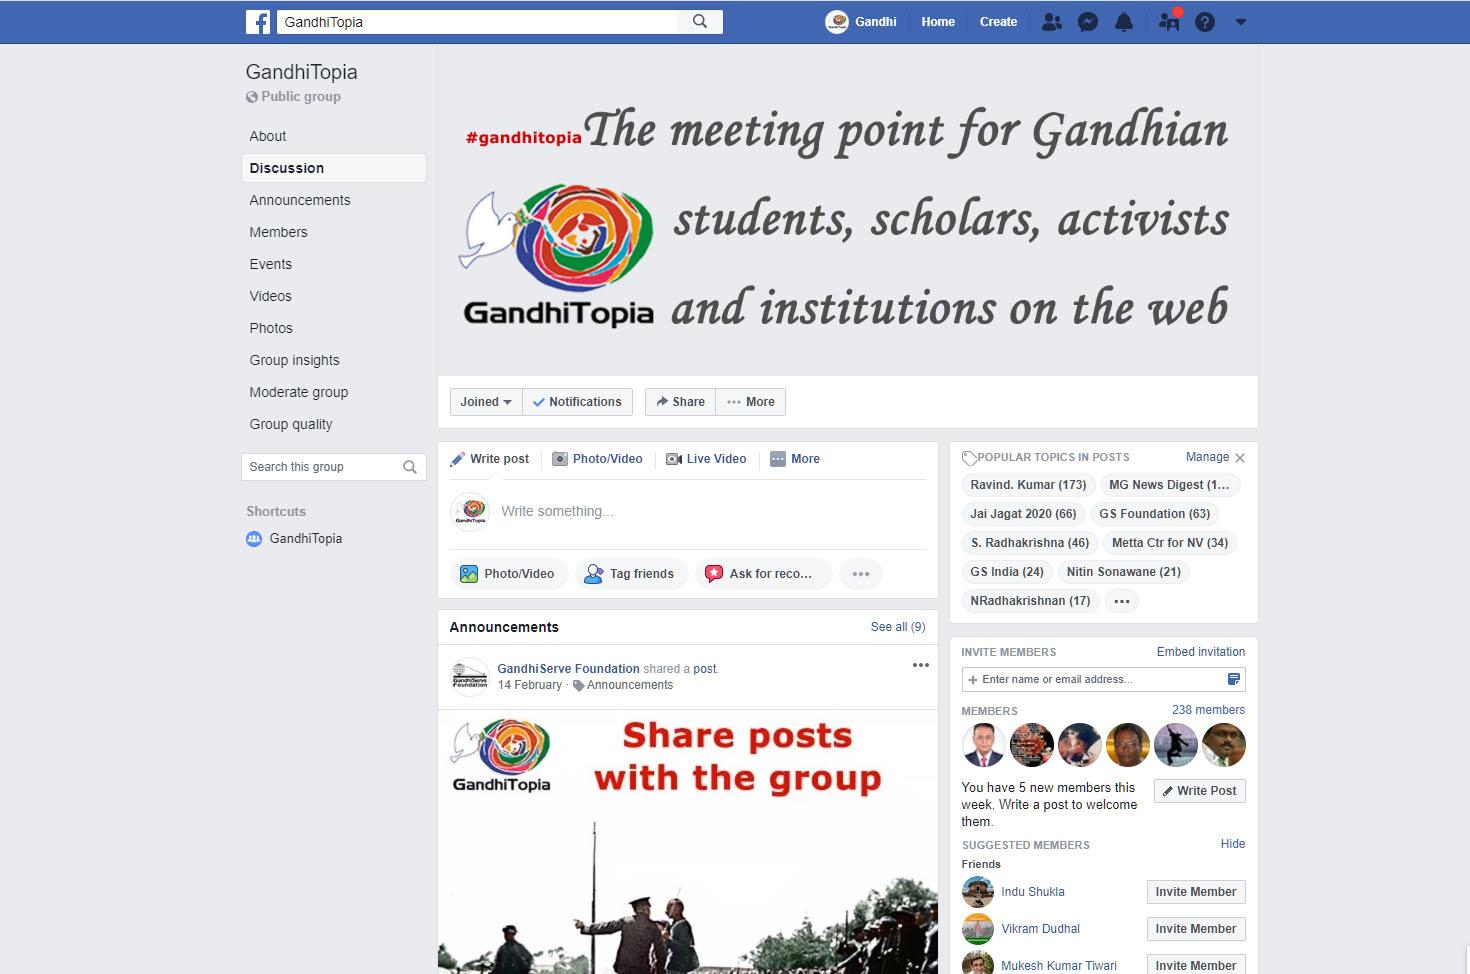 GandhiTopia